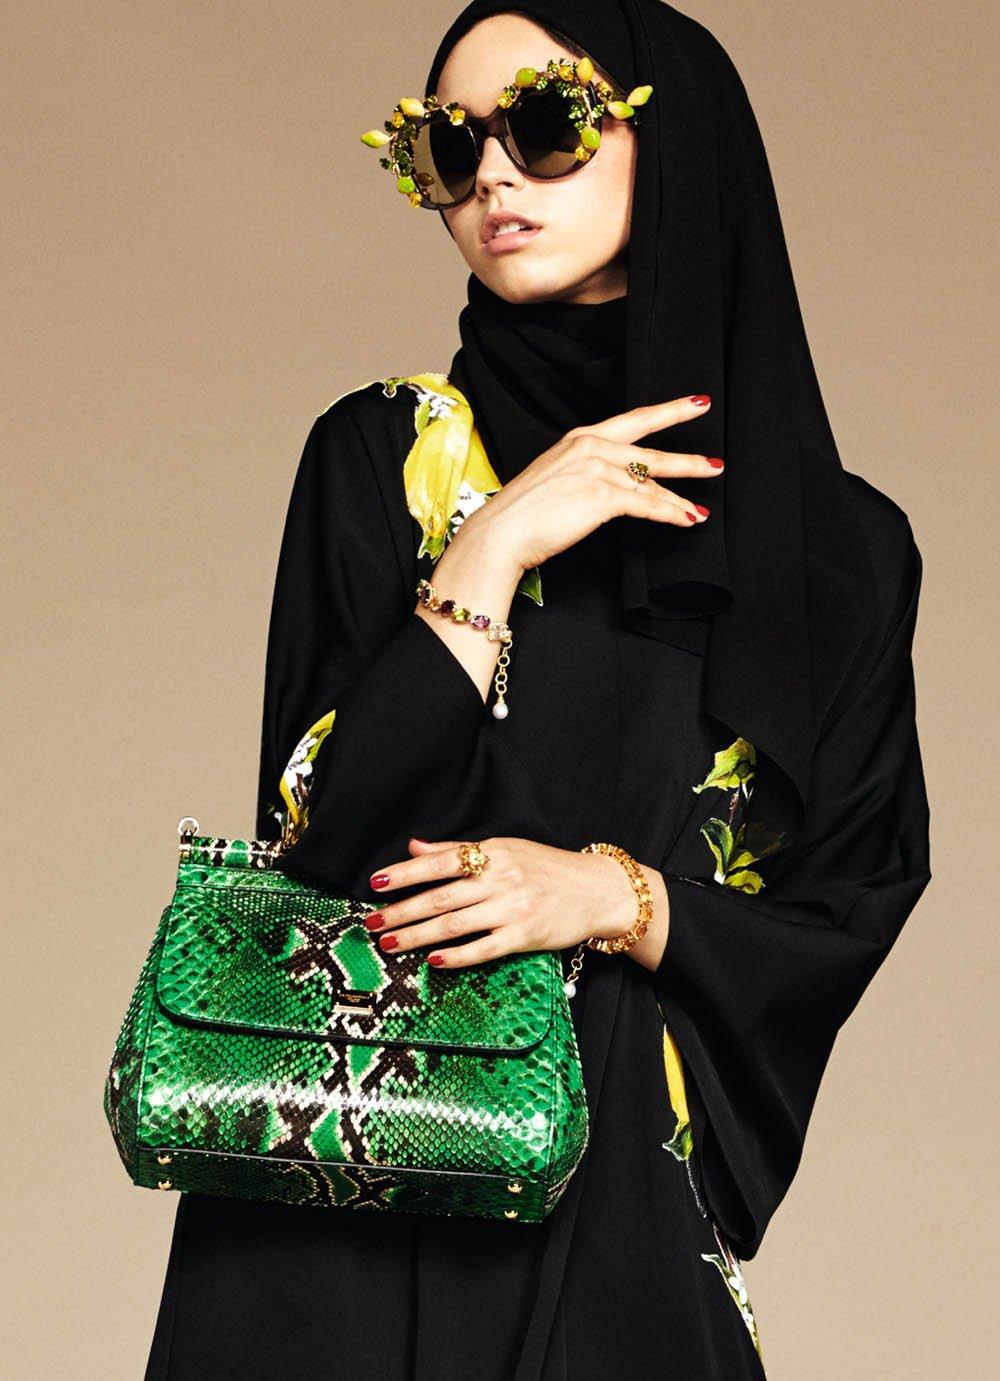 griot-mag-2-dolce-gabbana-hijab-abaja-velo-islam-6